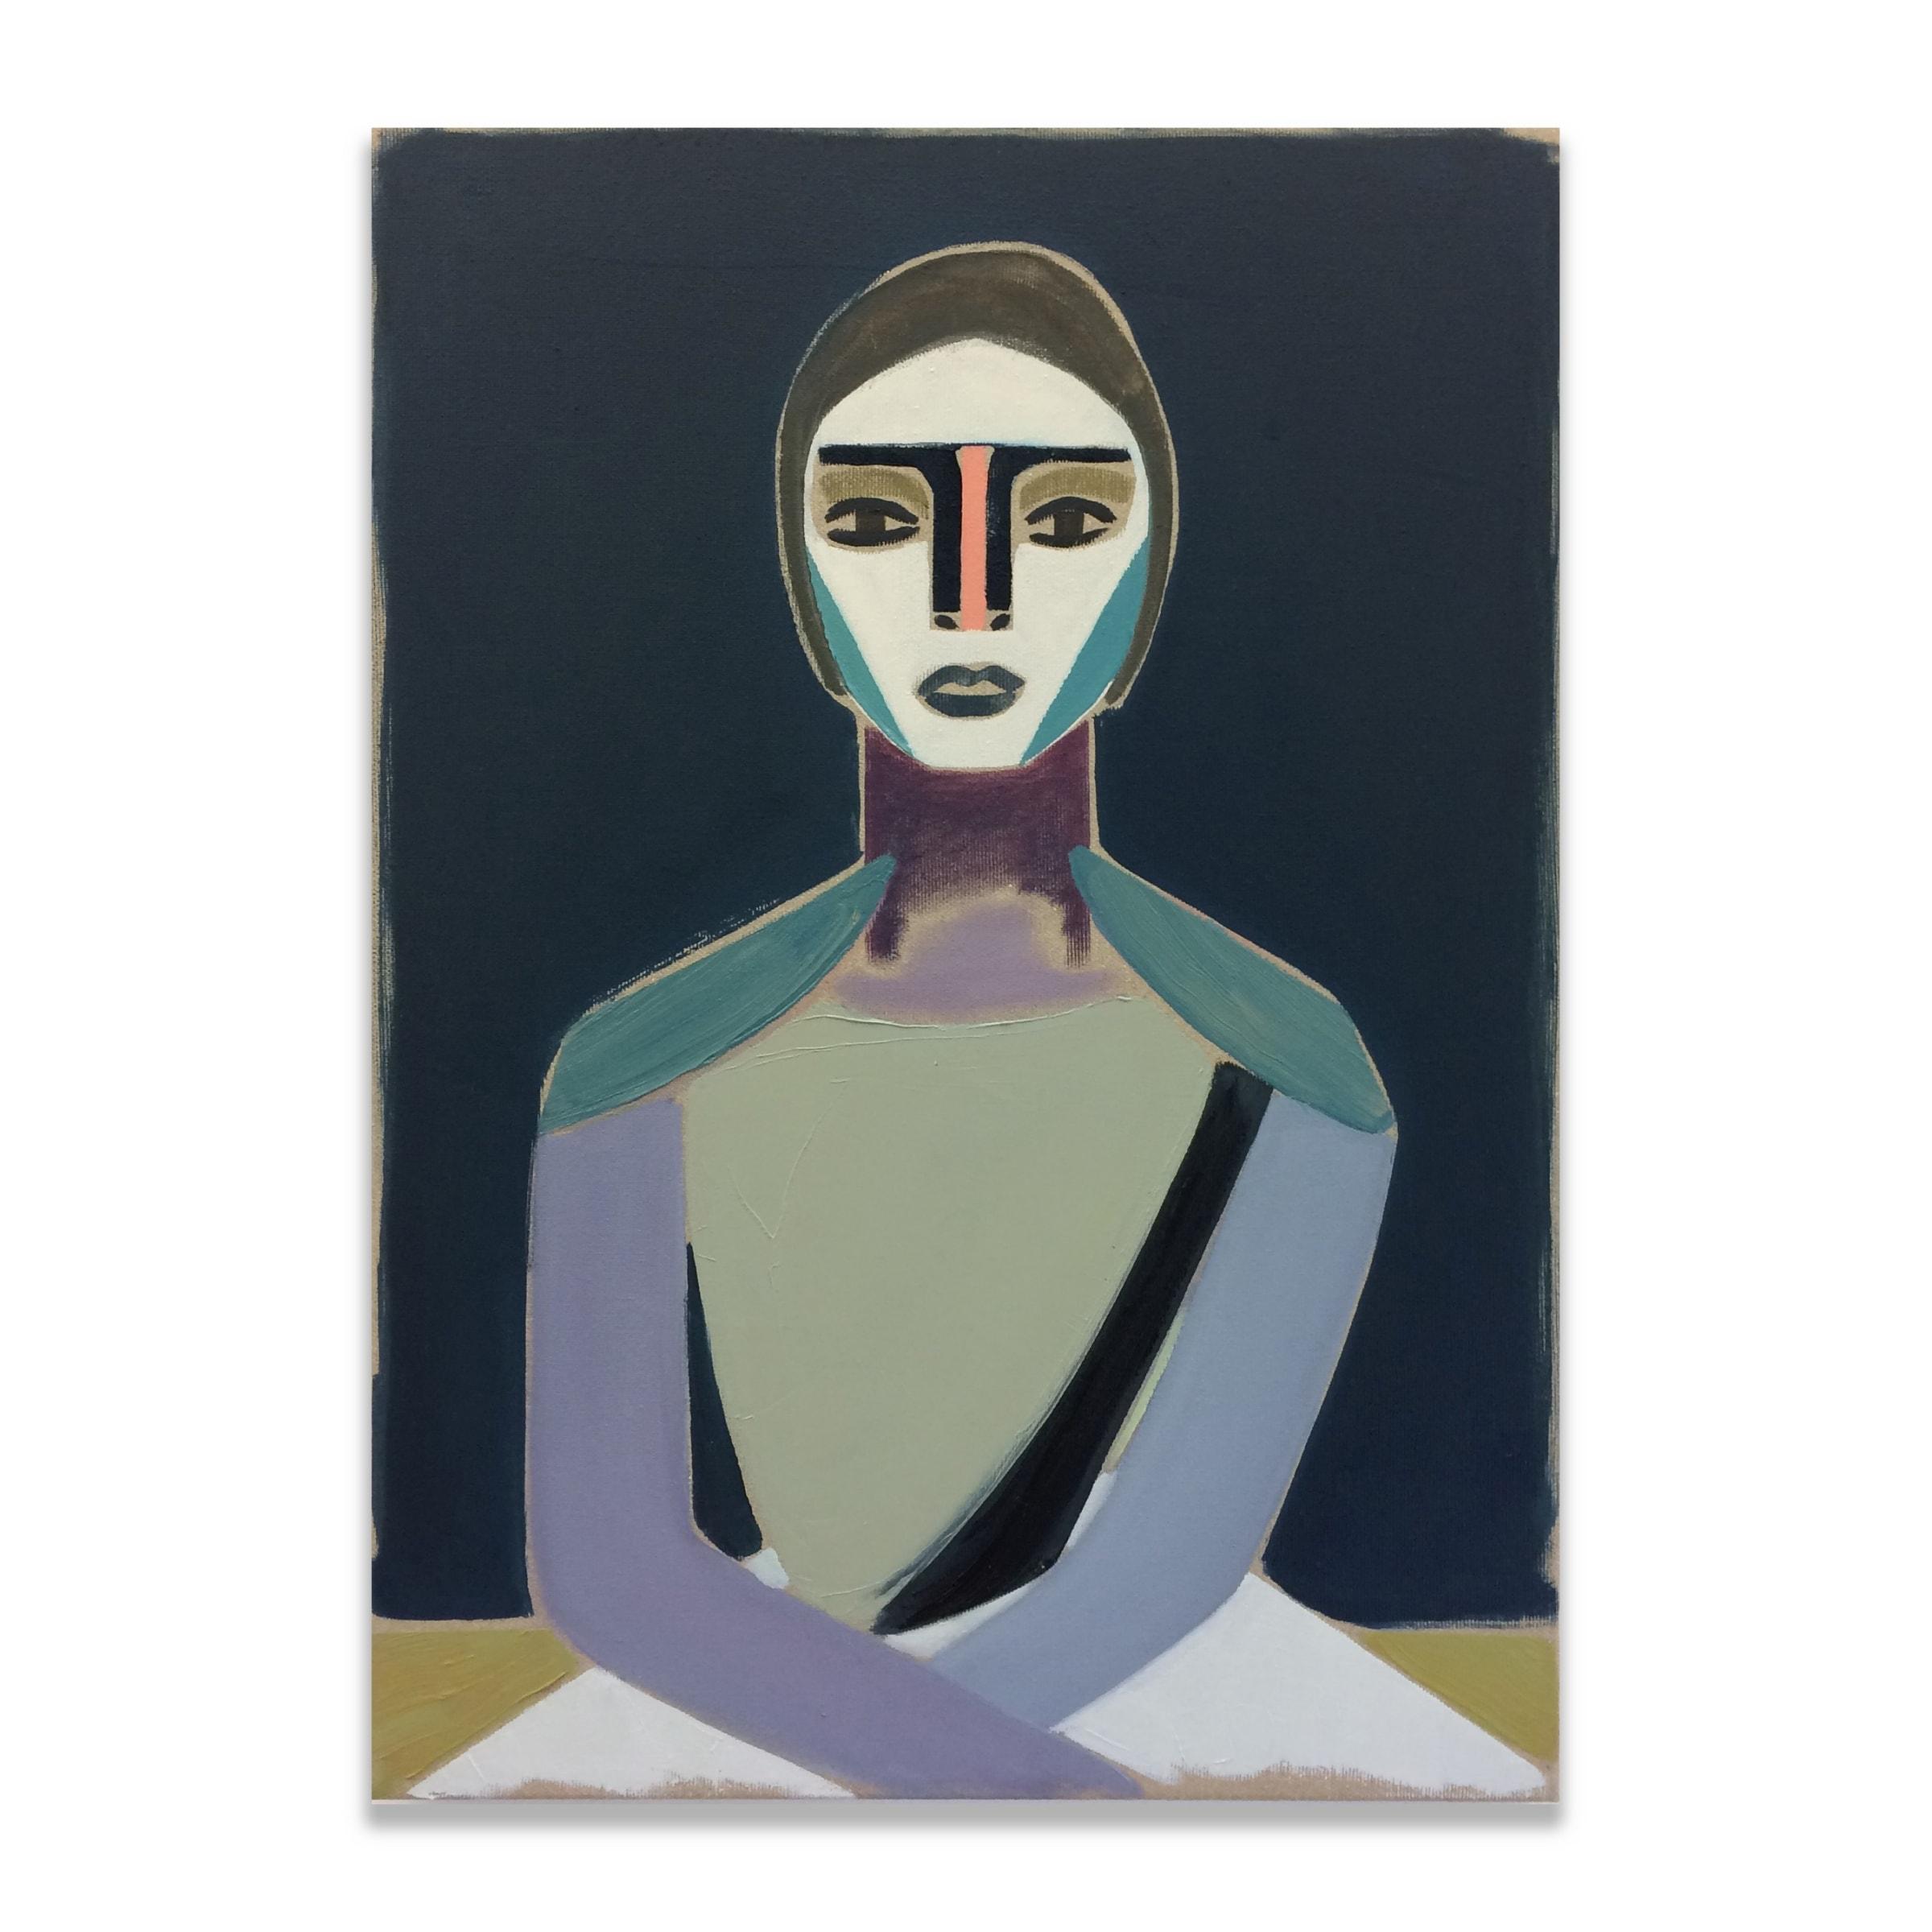 885ac447c Henrik Godsk, 'The Drifter', oil on canvas, 50 x 36cm